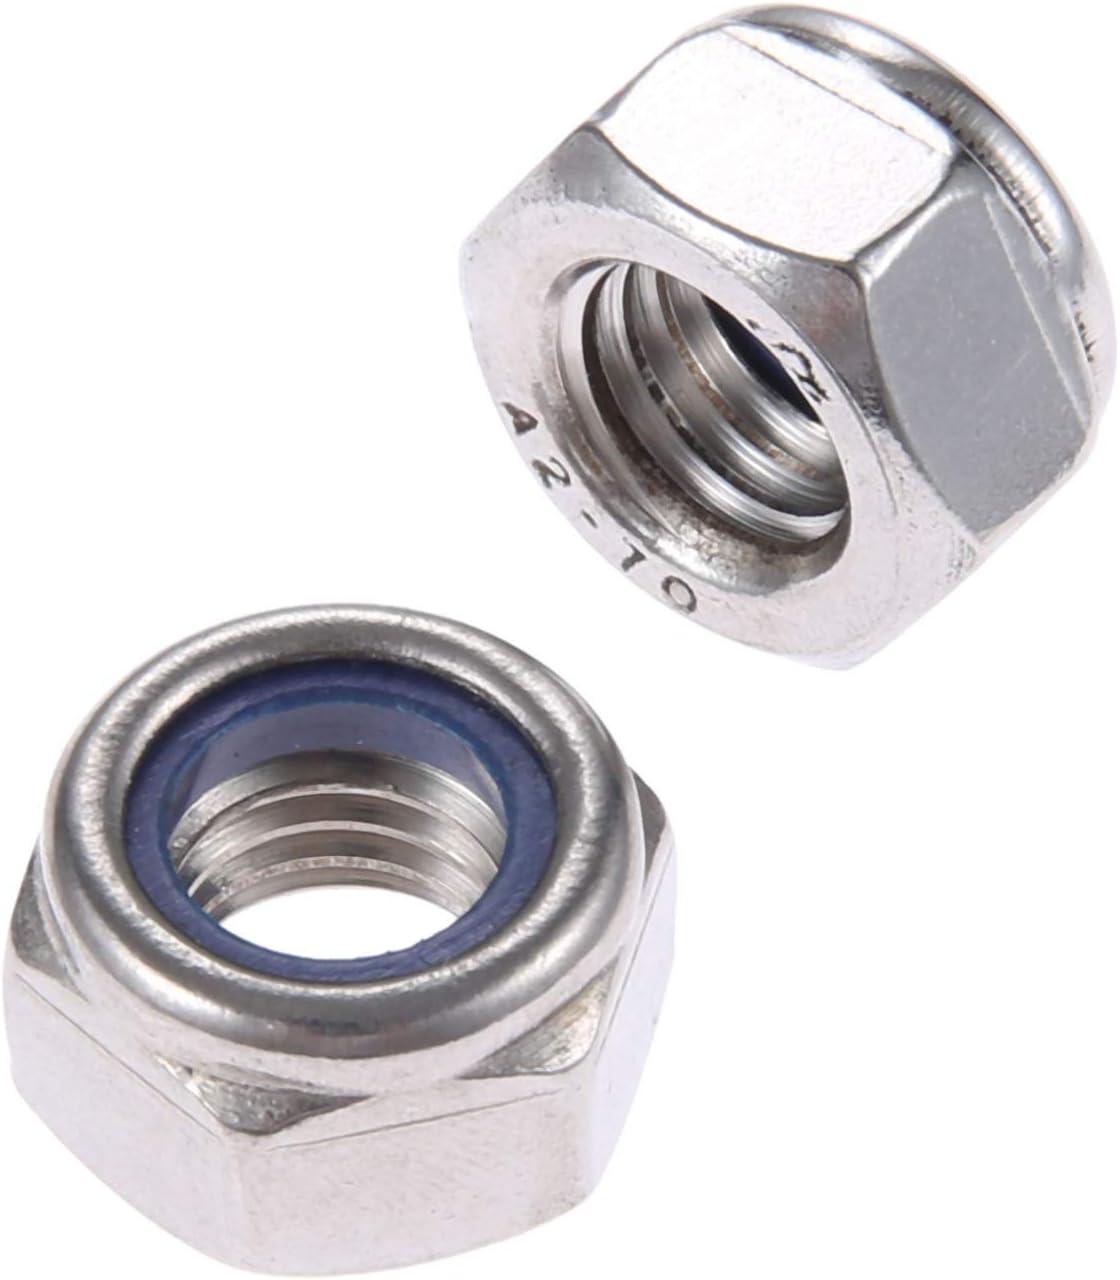 Beennex 165pcs Stainless Steel SS304 Nylon Insert Locknut Assortment Kit M3 M4 M5 M6 M8 M10 M12